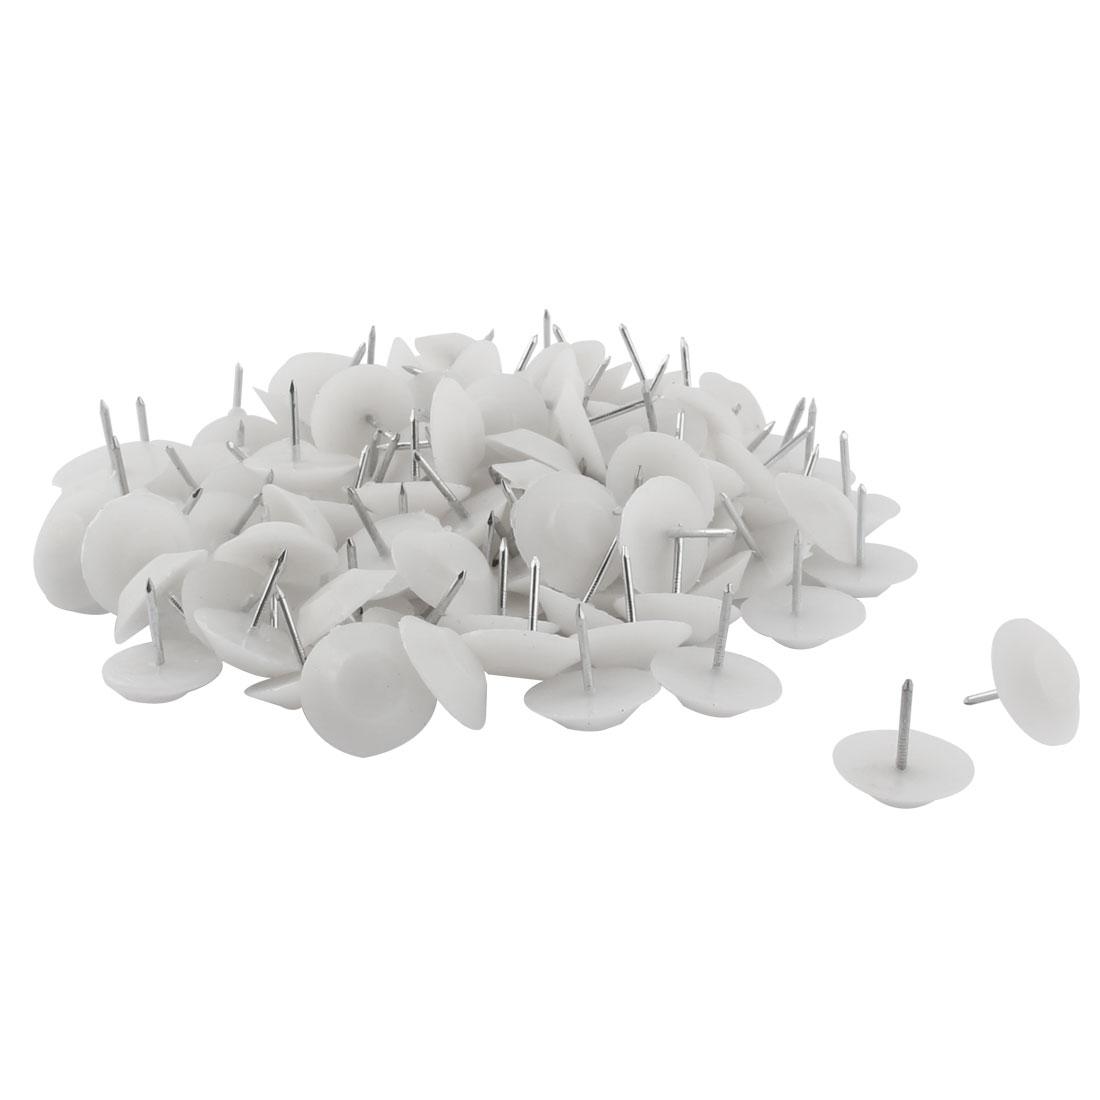 Furniture Feet Anti-slide Floor Protector Pad Nails 20mm Head Dia 100 Pcs